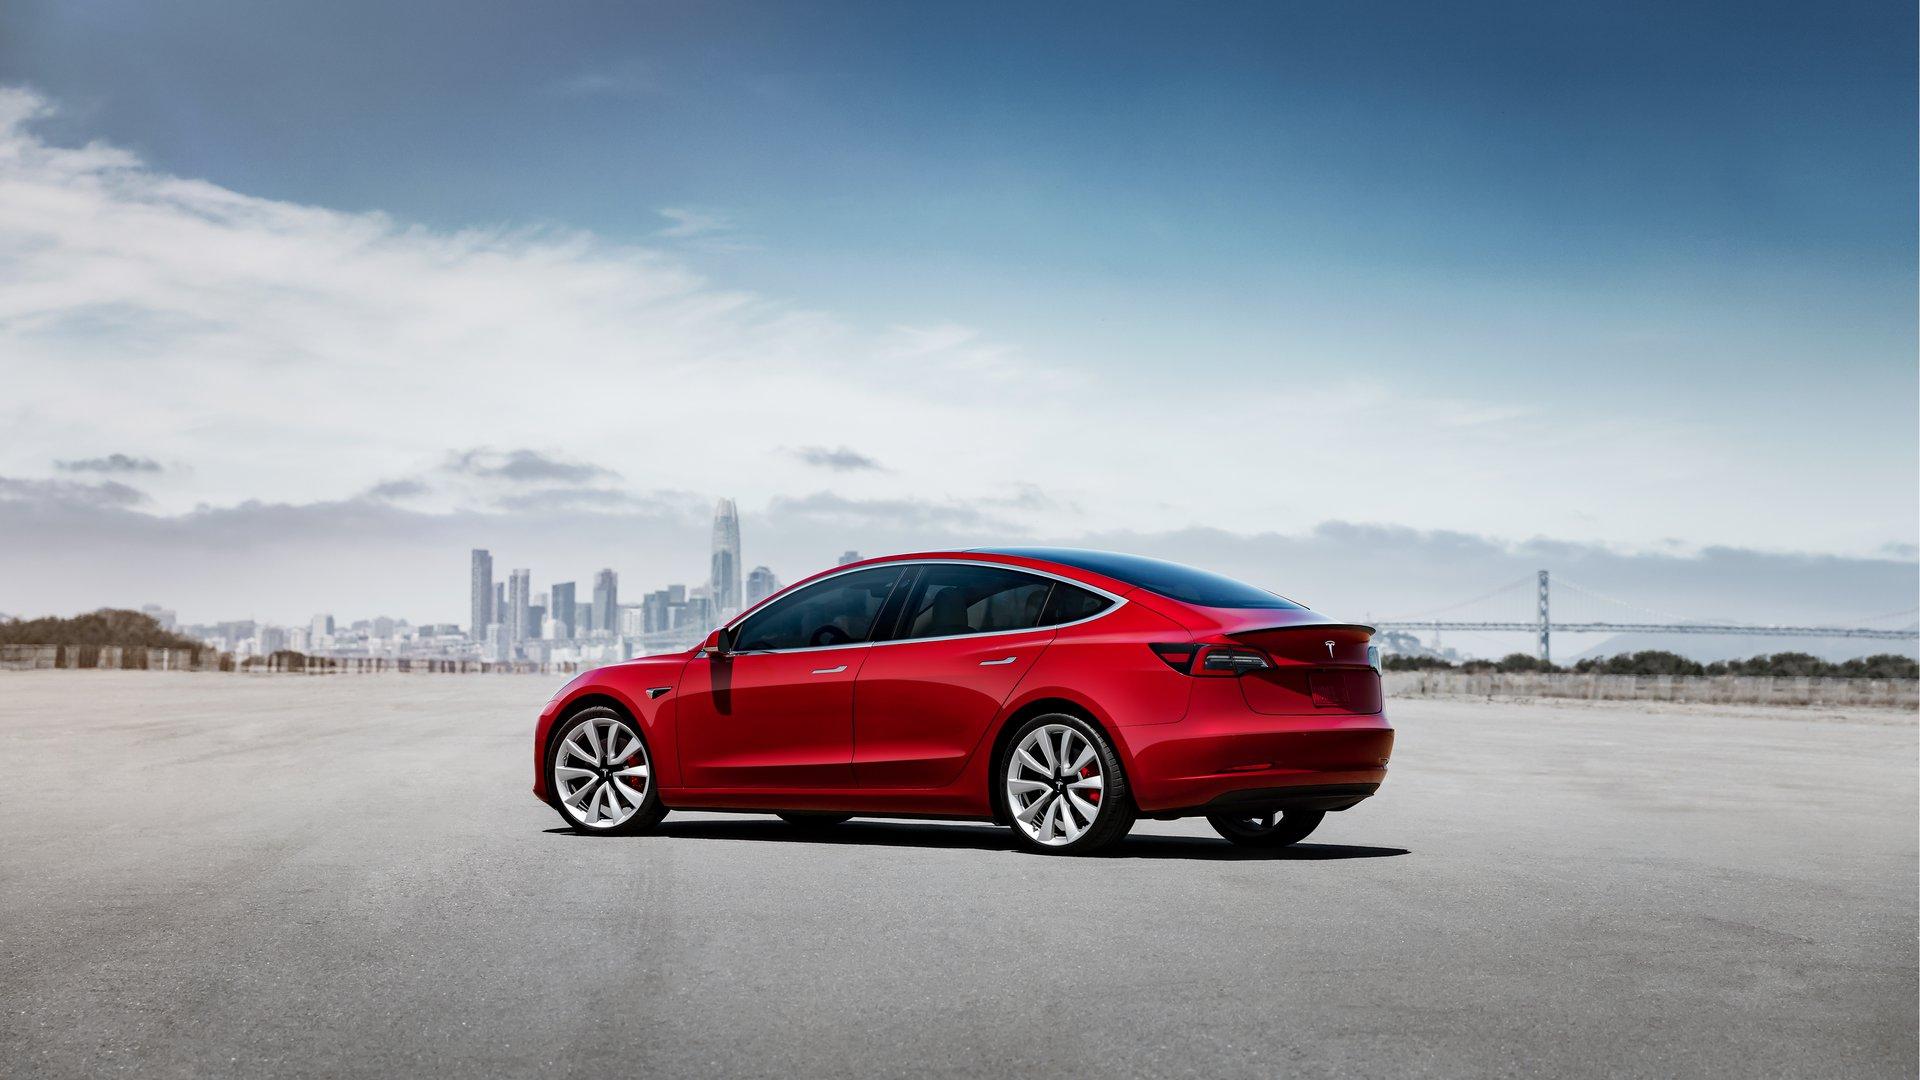 Whant Performance Tesla Model 3 For Less Money You Got It